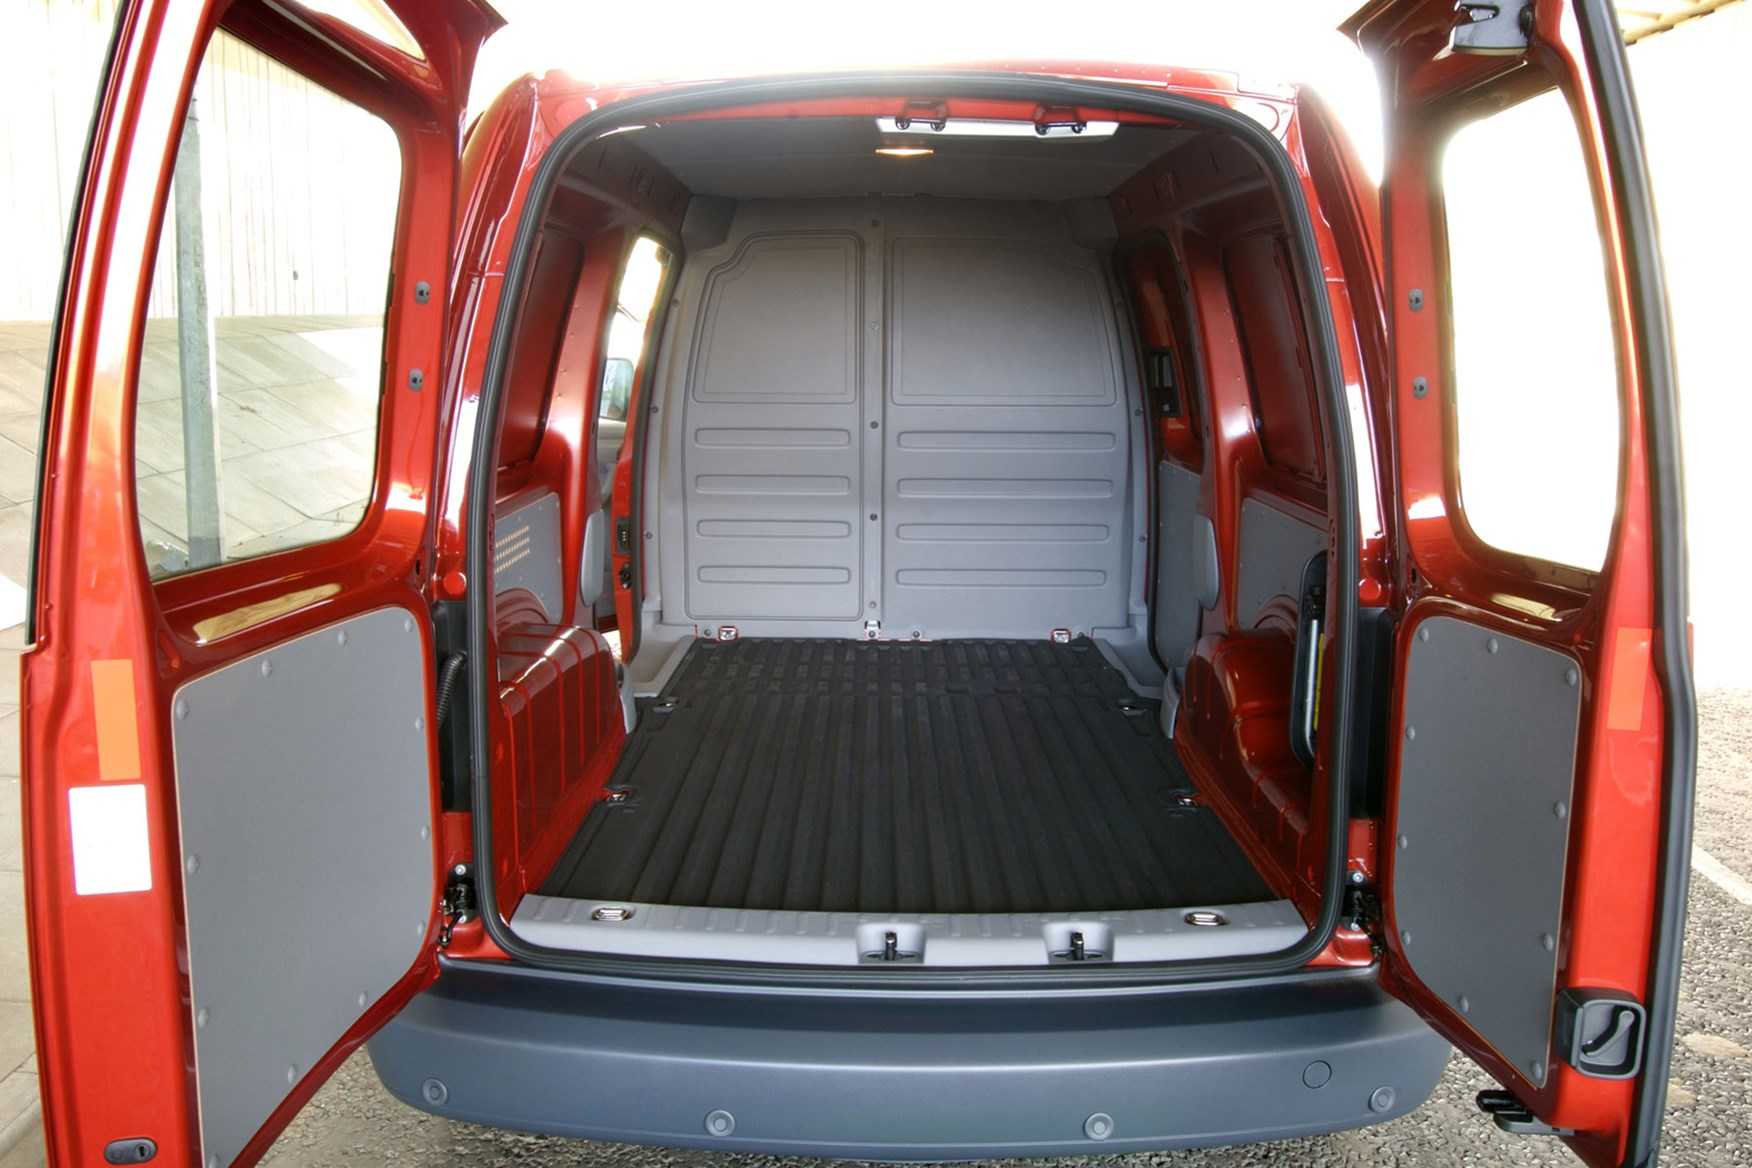 Volkswagen Caddy Van Dimensions 2004 2010 Capacity Payload Volume Towing Parkers